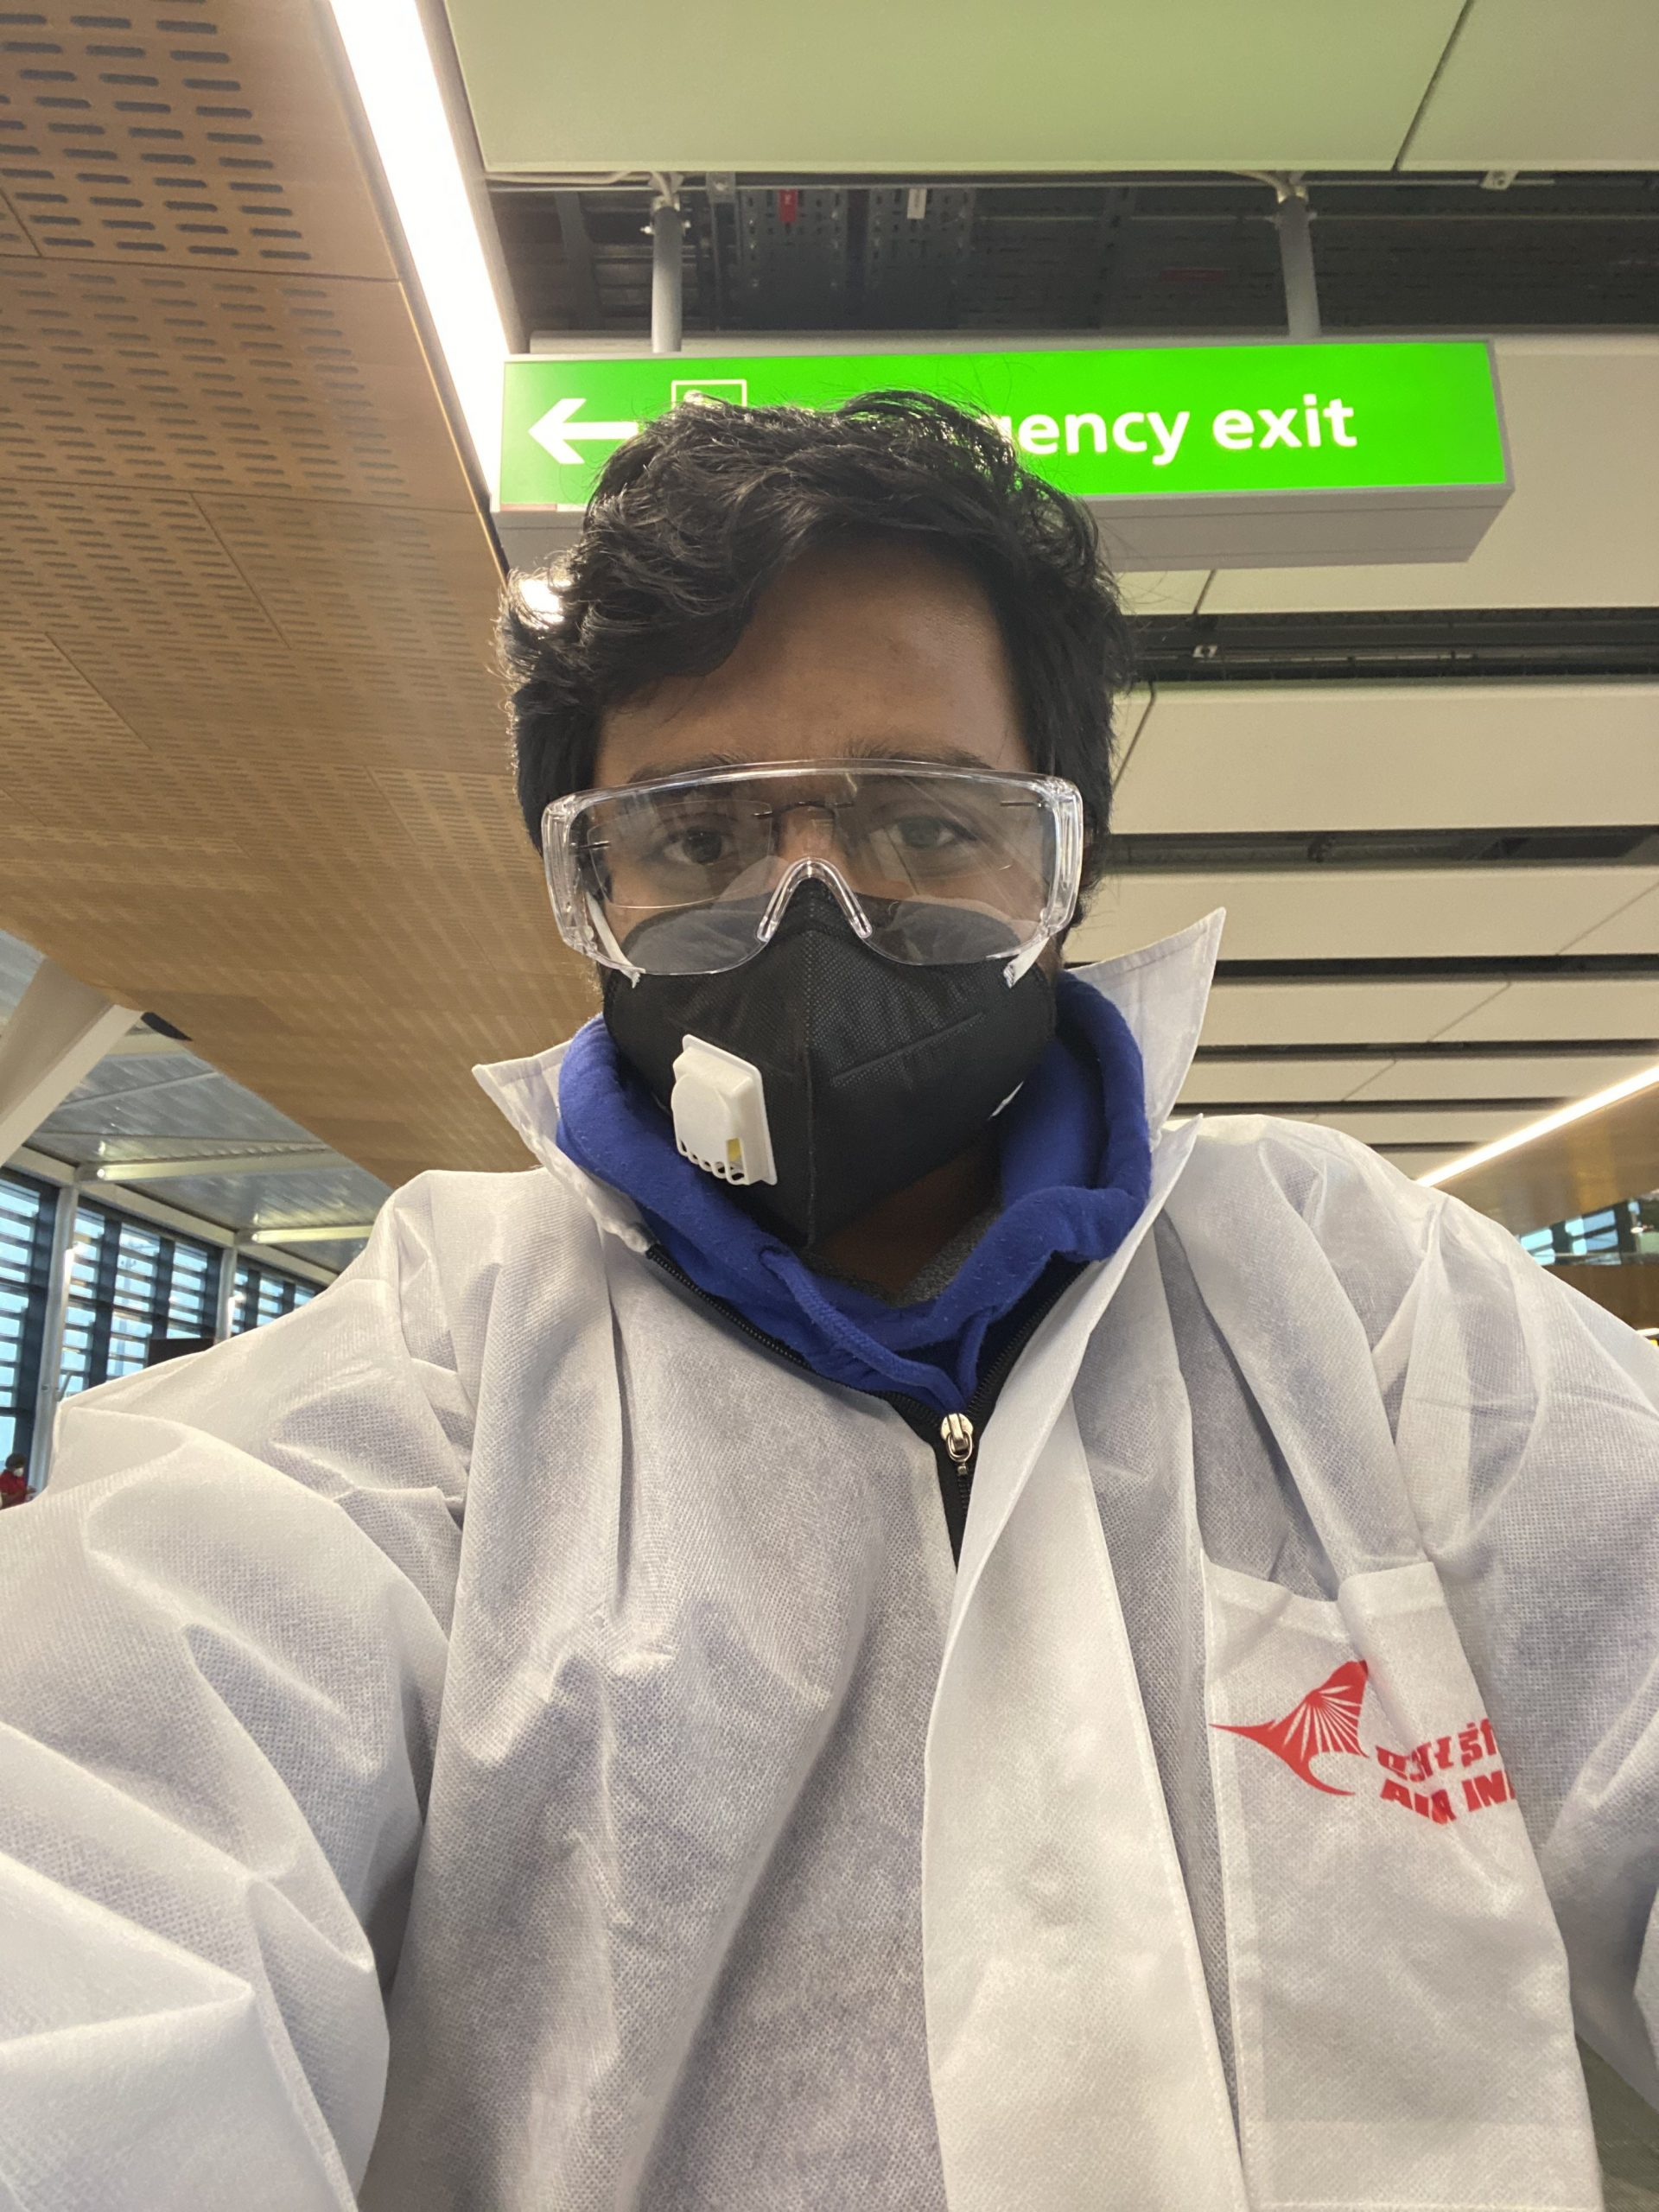 Ram Kumar - Repatriation flight hazmat suit and PPE